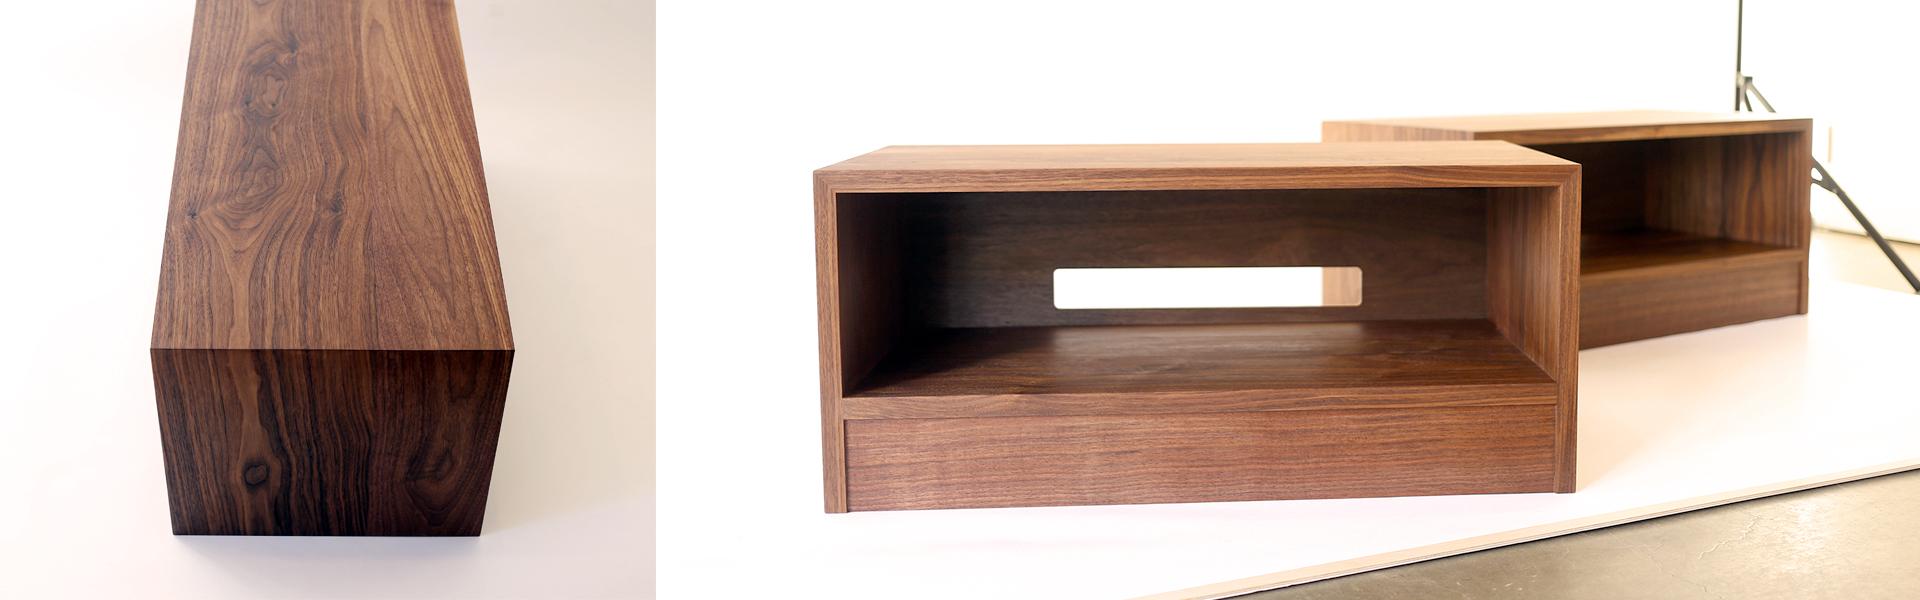 side_box_06